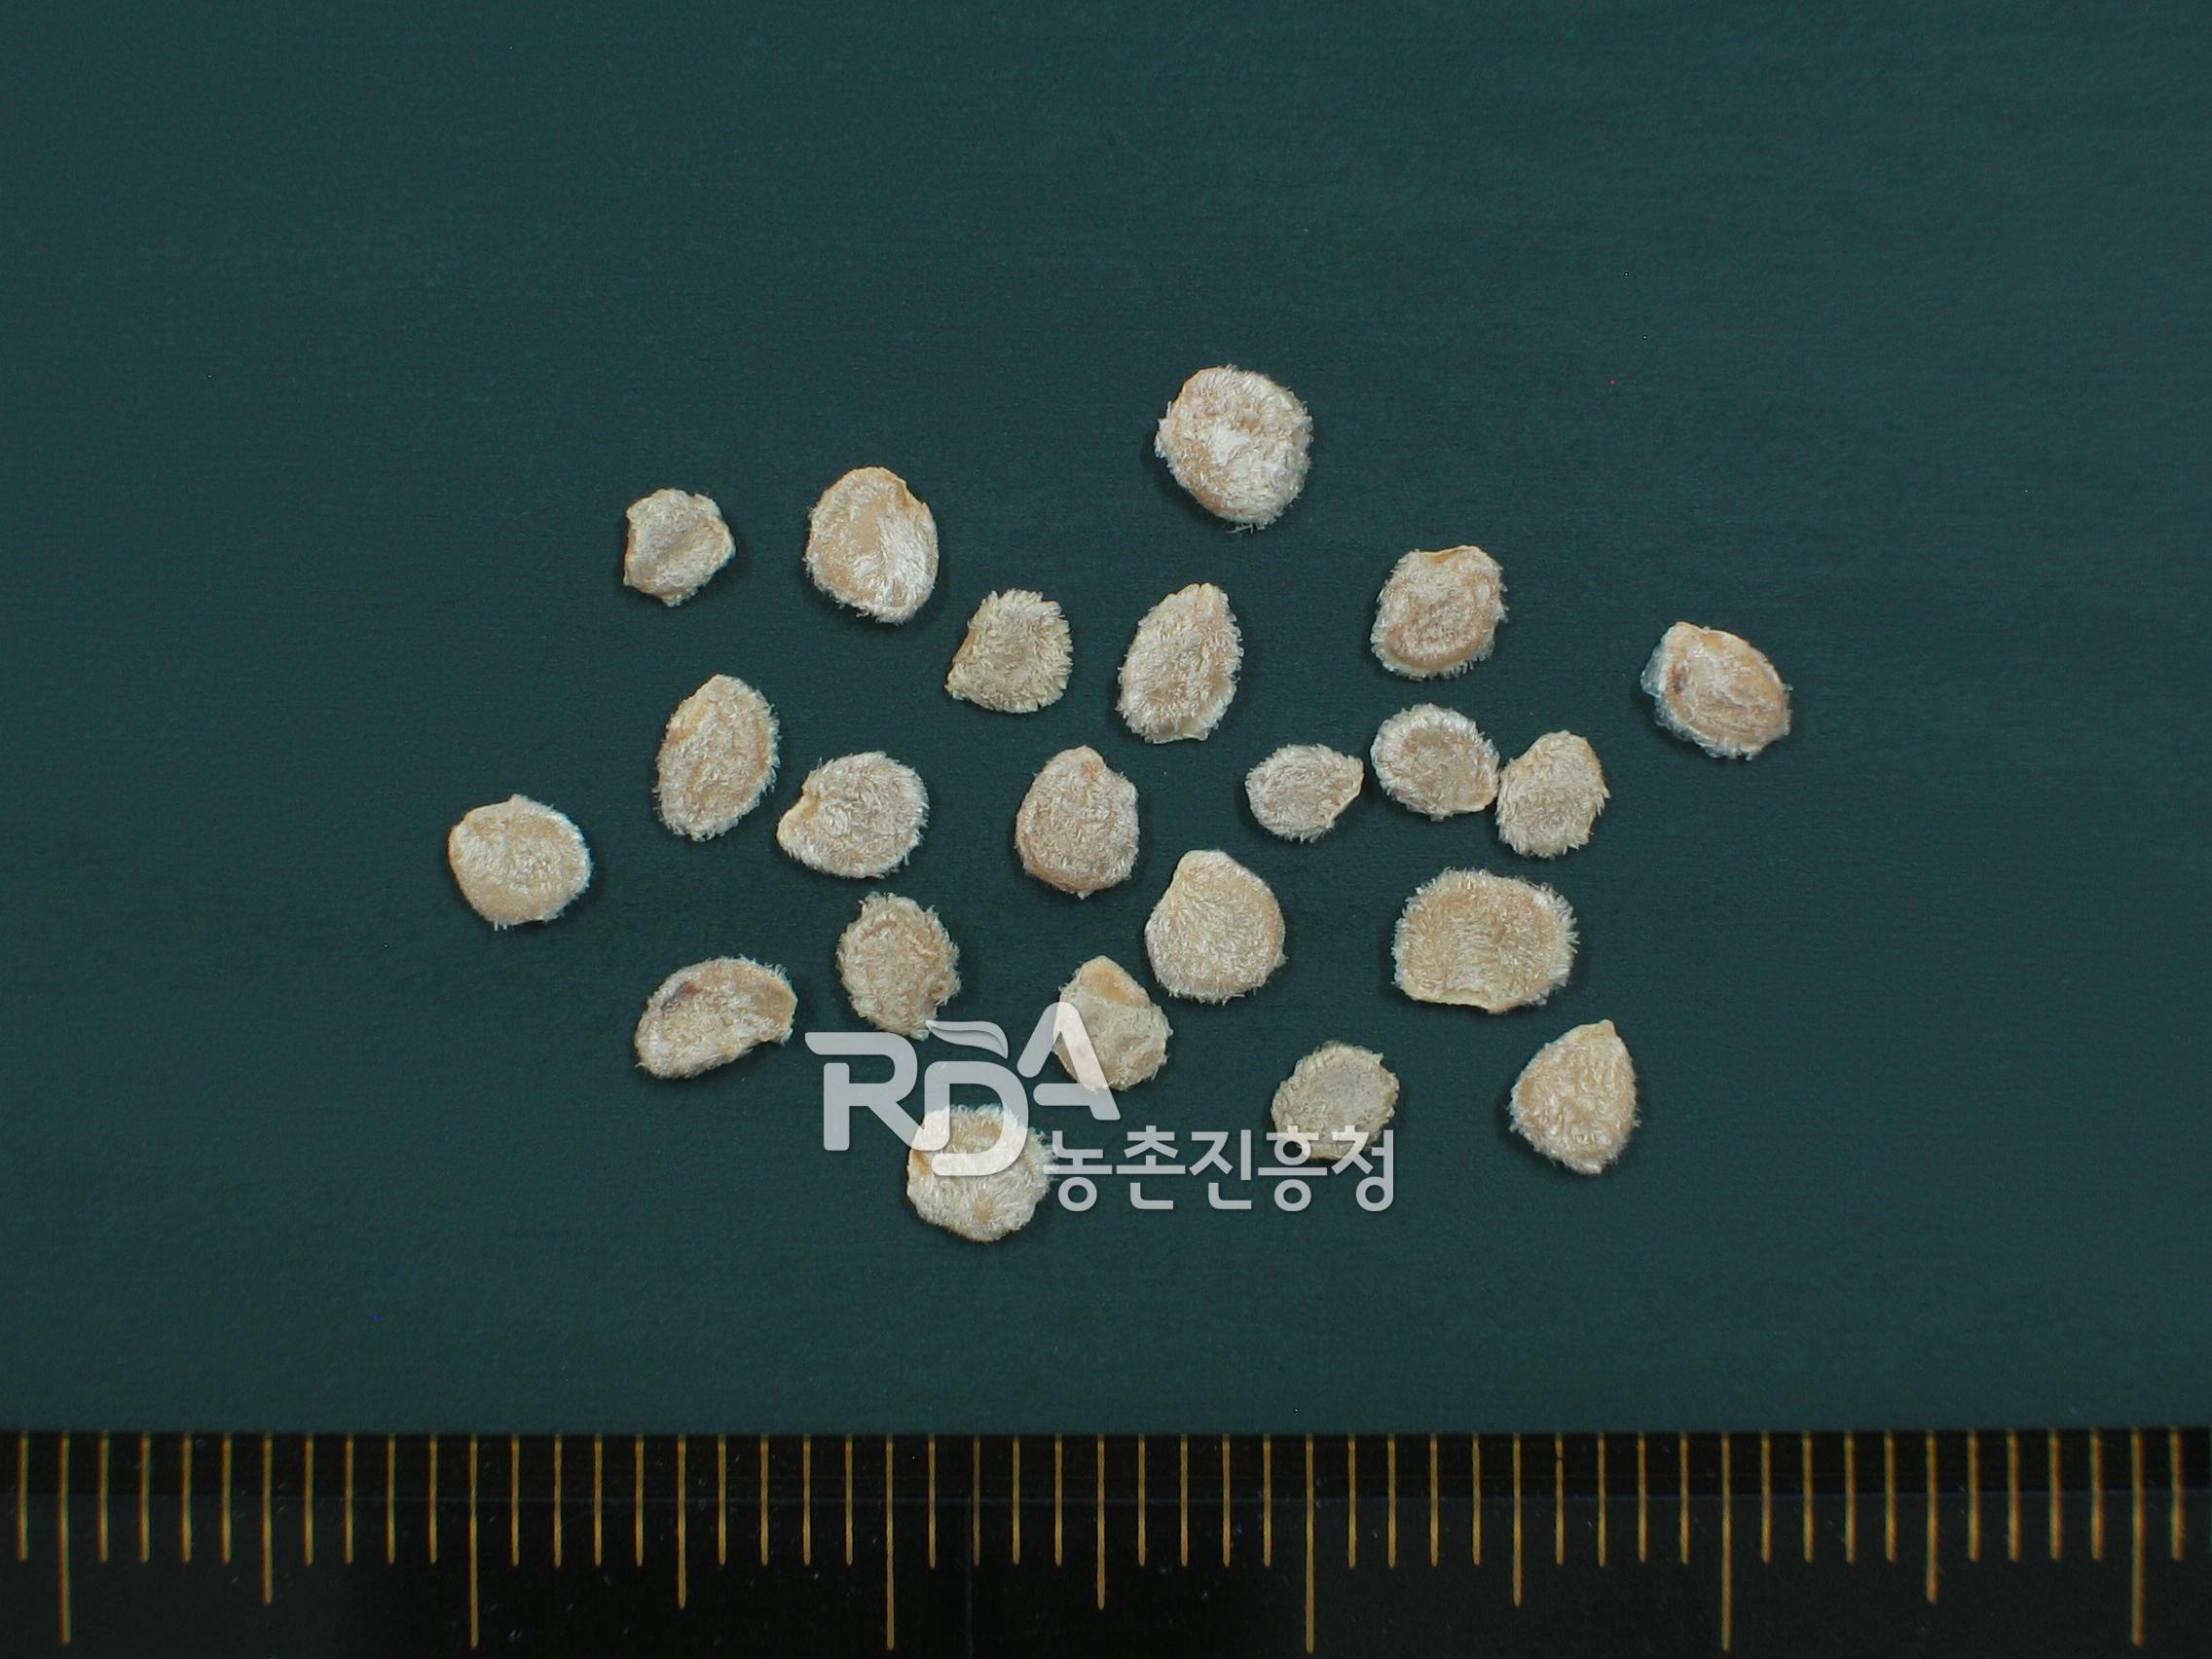 Lycopersicon hirsutum forma glabratum(토마토야생종) 대표 이미지